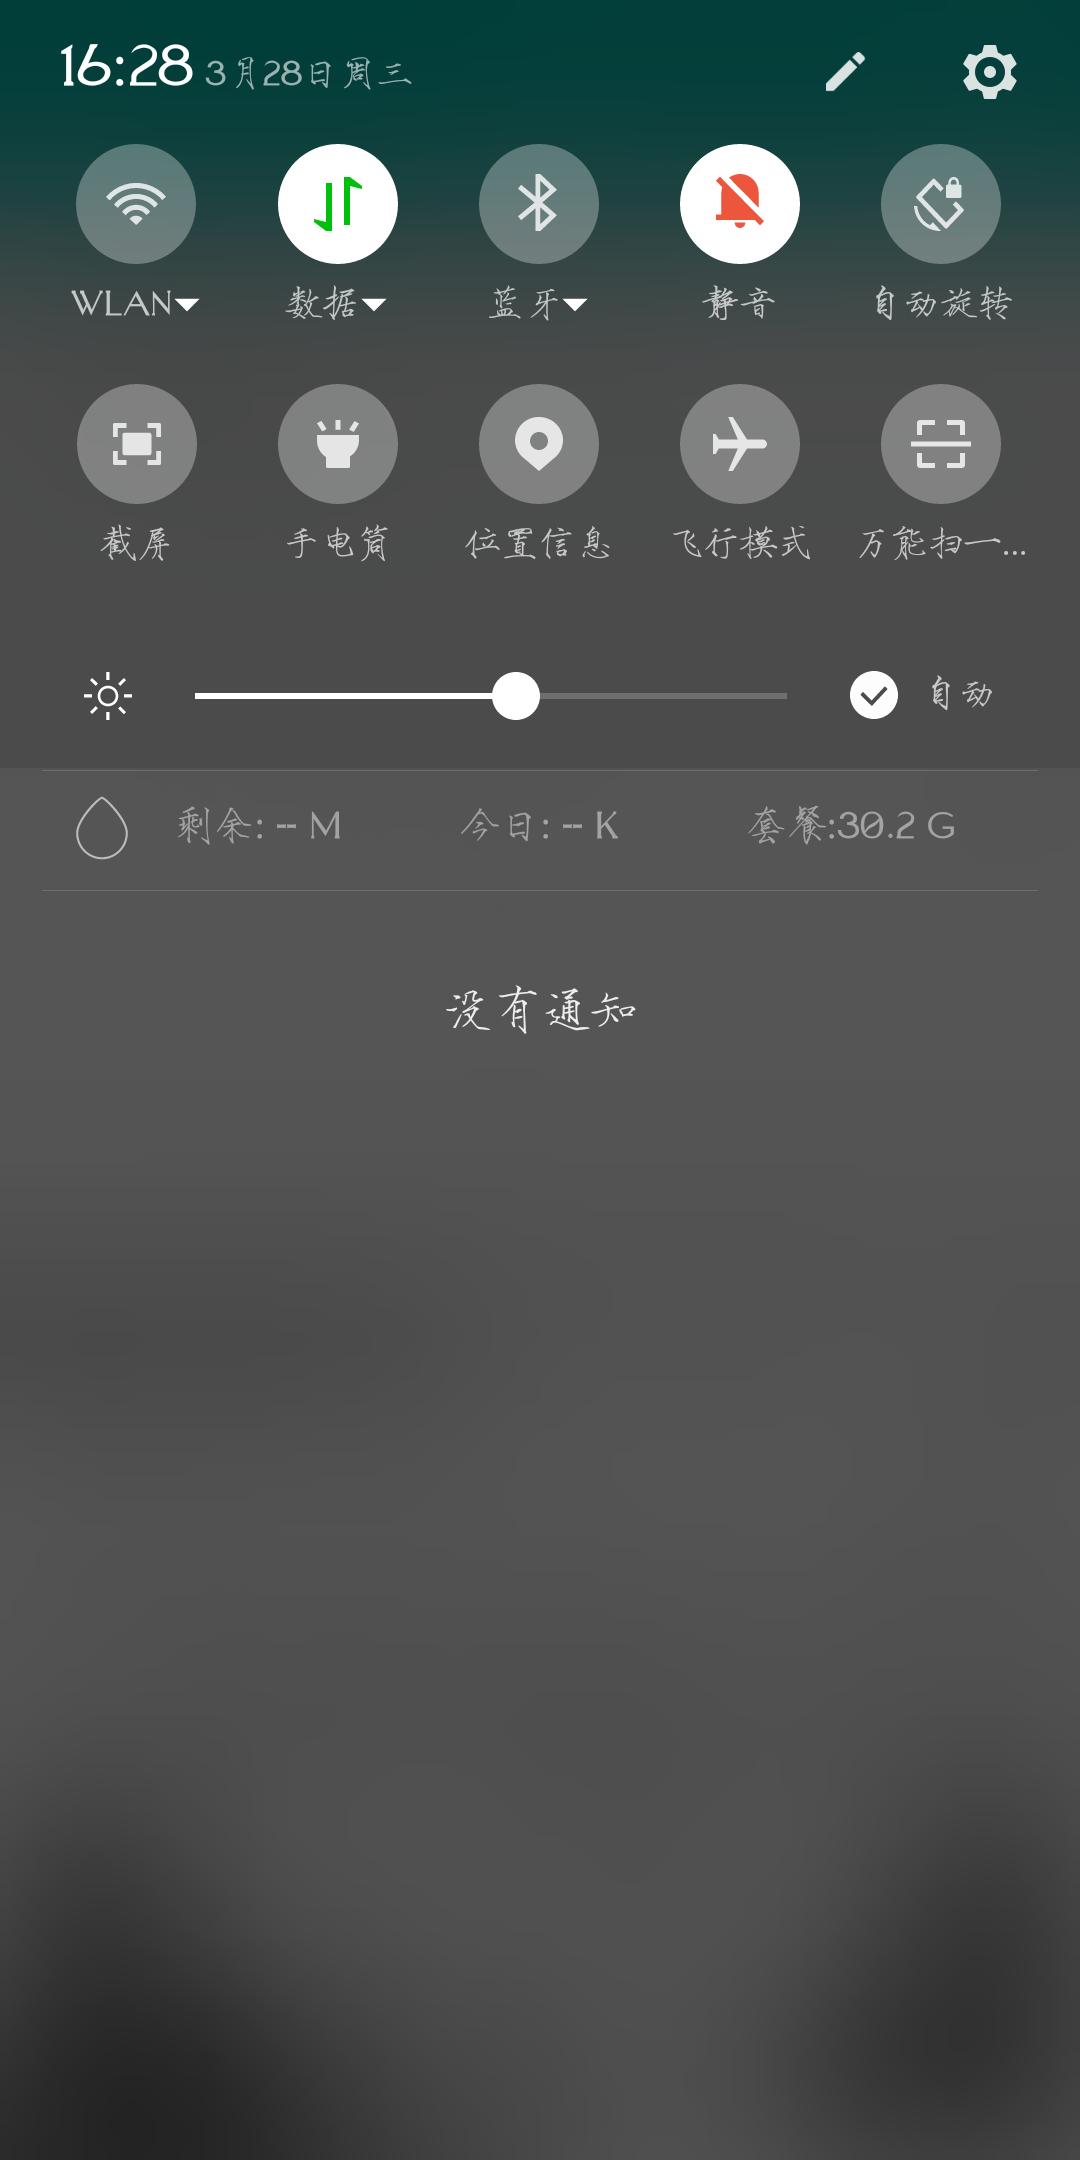 Screenshot_2018-03-28-16-28-14.png